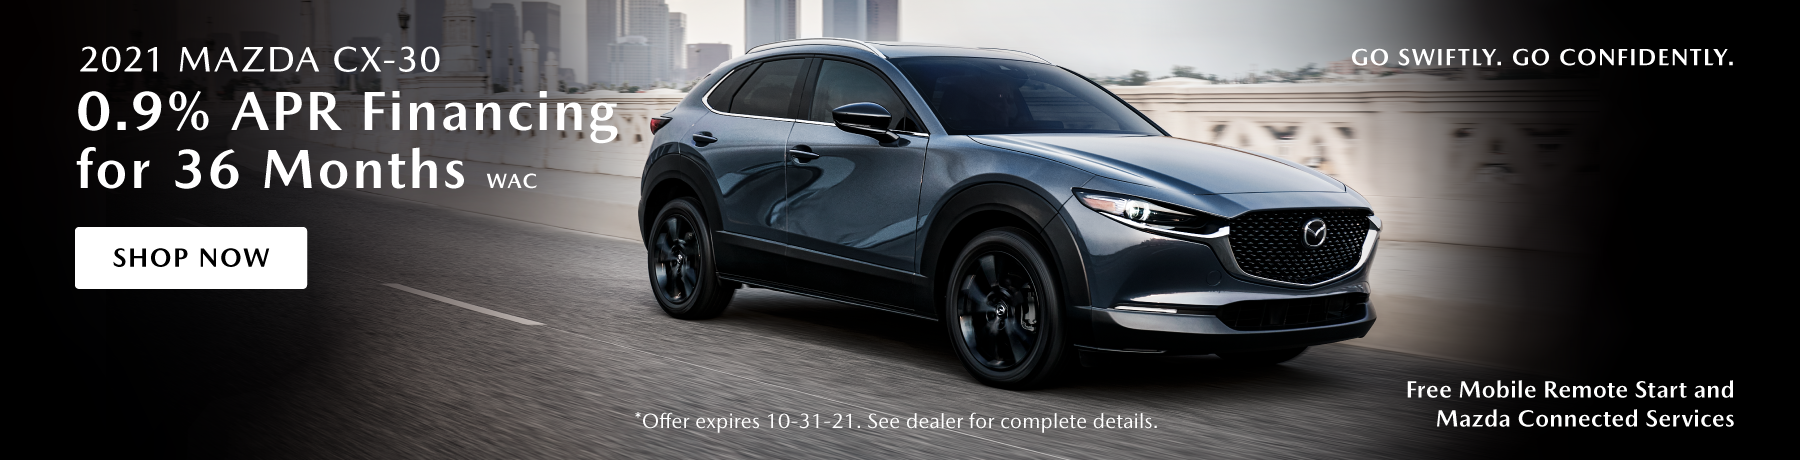 MazdaPlace-OEM-1021_CX30